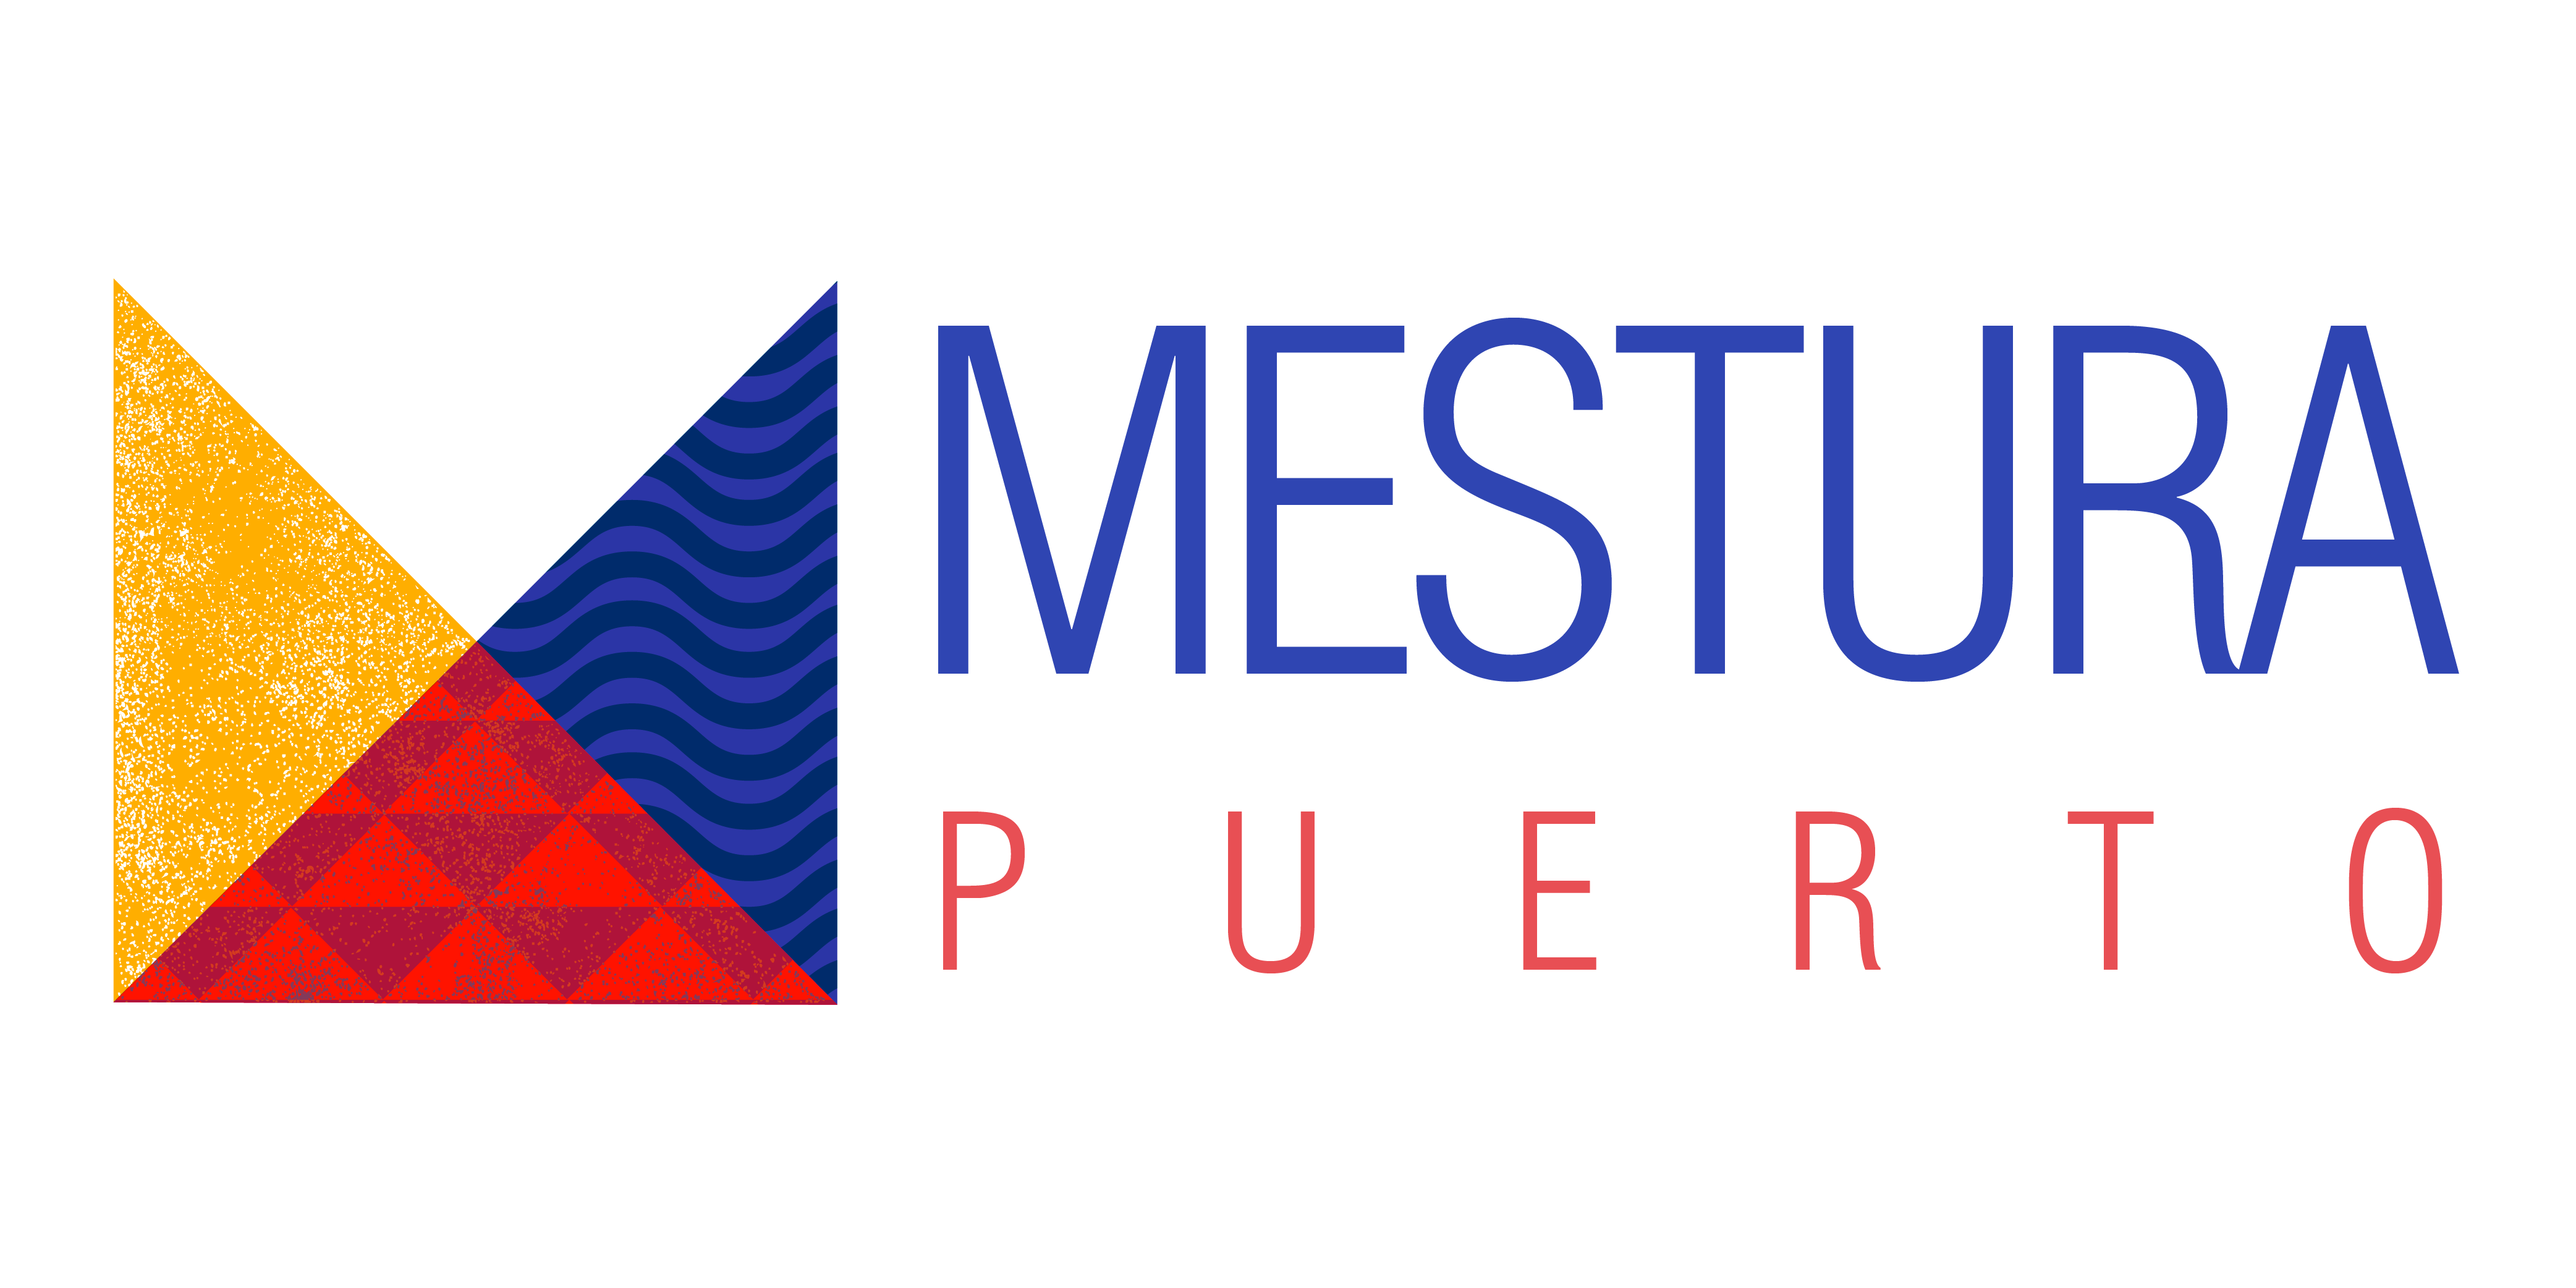 Puerto Mestura